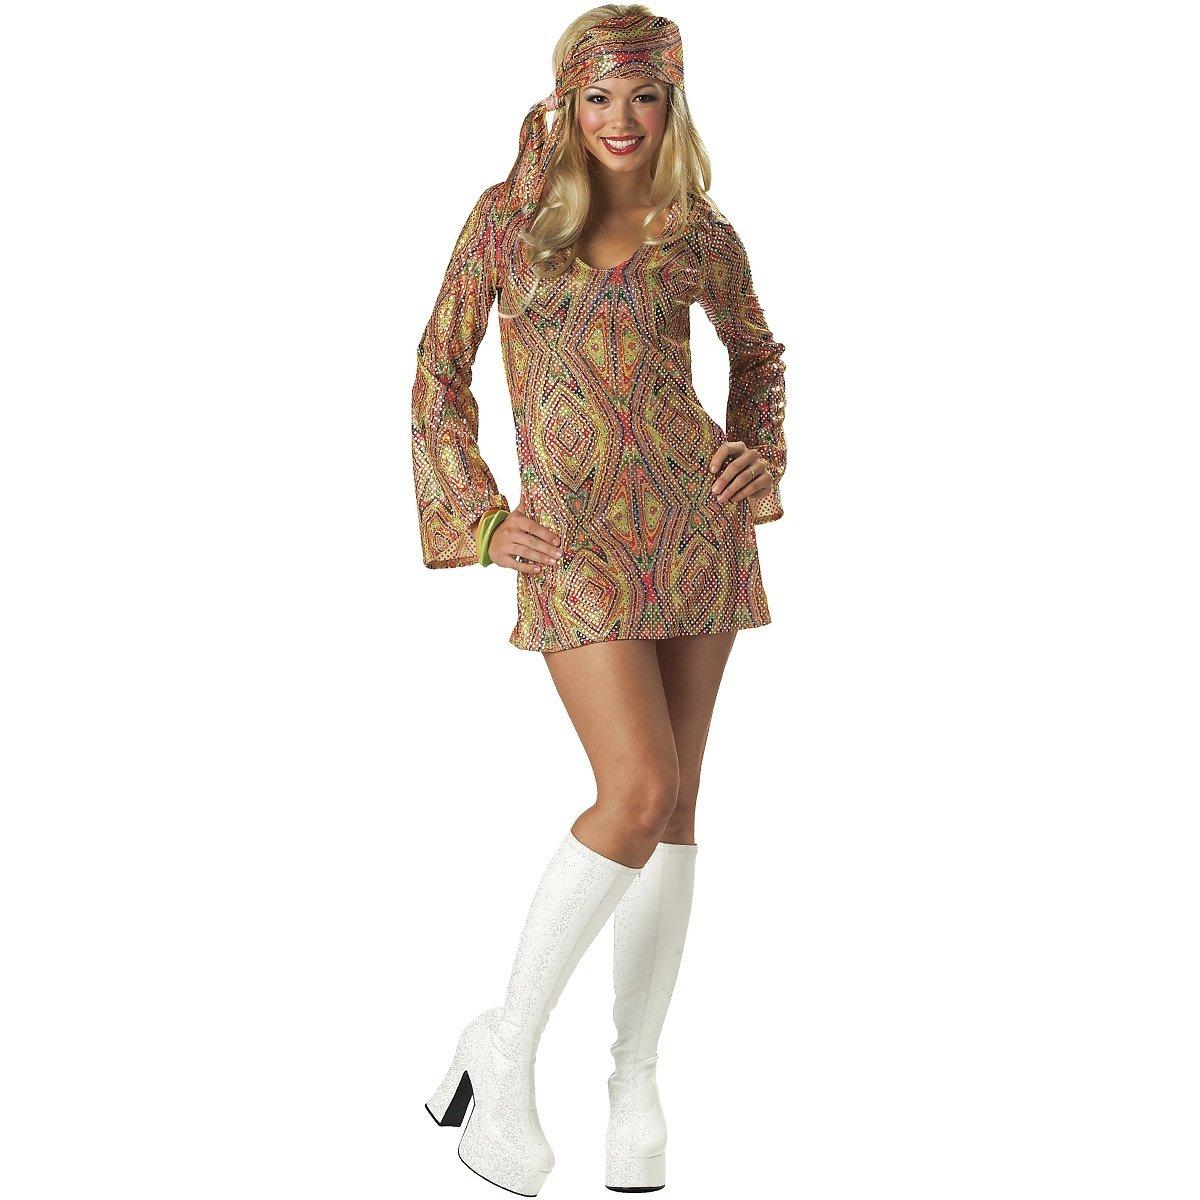 Amazon.com: Disco Dolly – Disfraz Plus tamaño 2 X – Tamaño ...